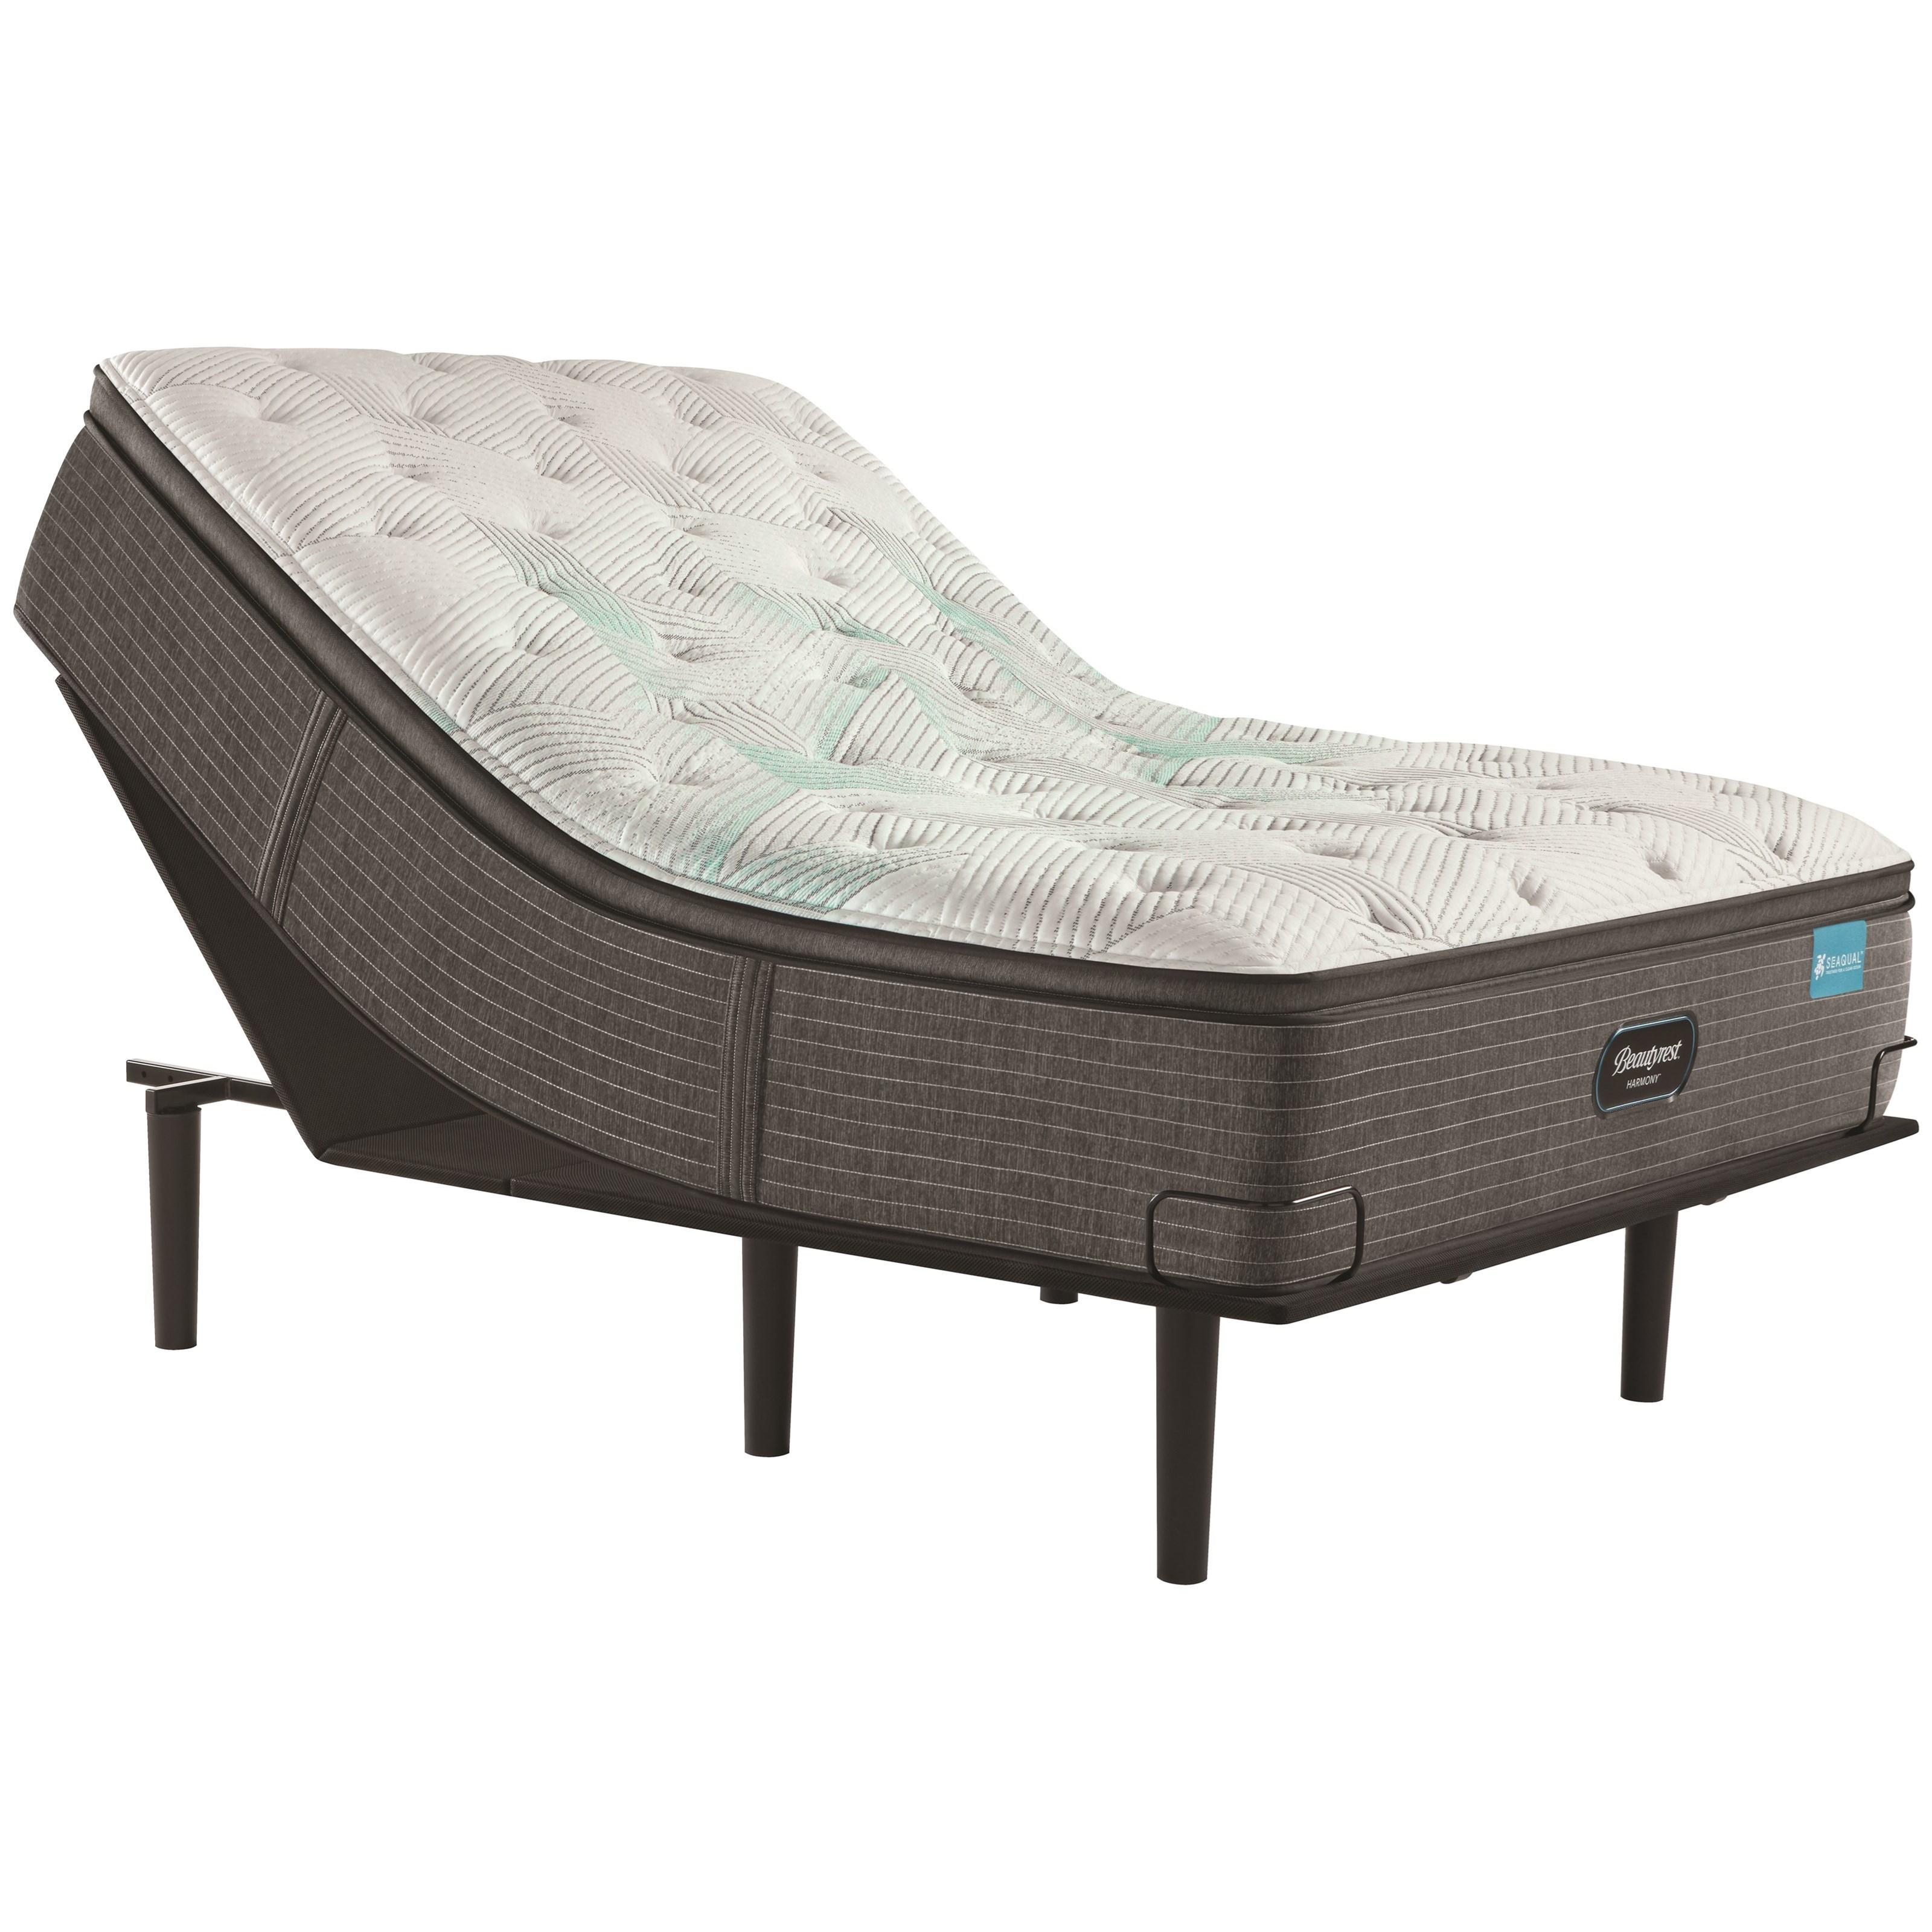 "Cal King 15 1/2"" Medium Pillow Top Mattress and Simple Motion Adjustable Base"